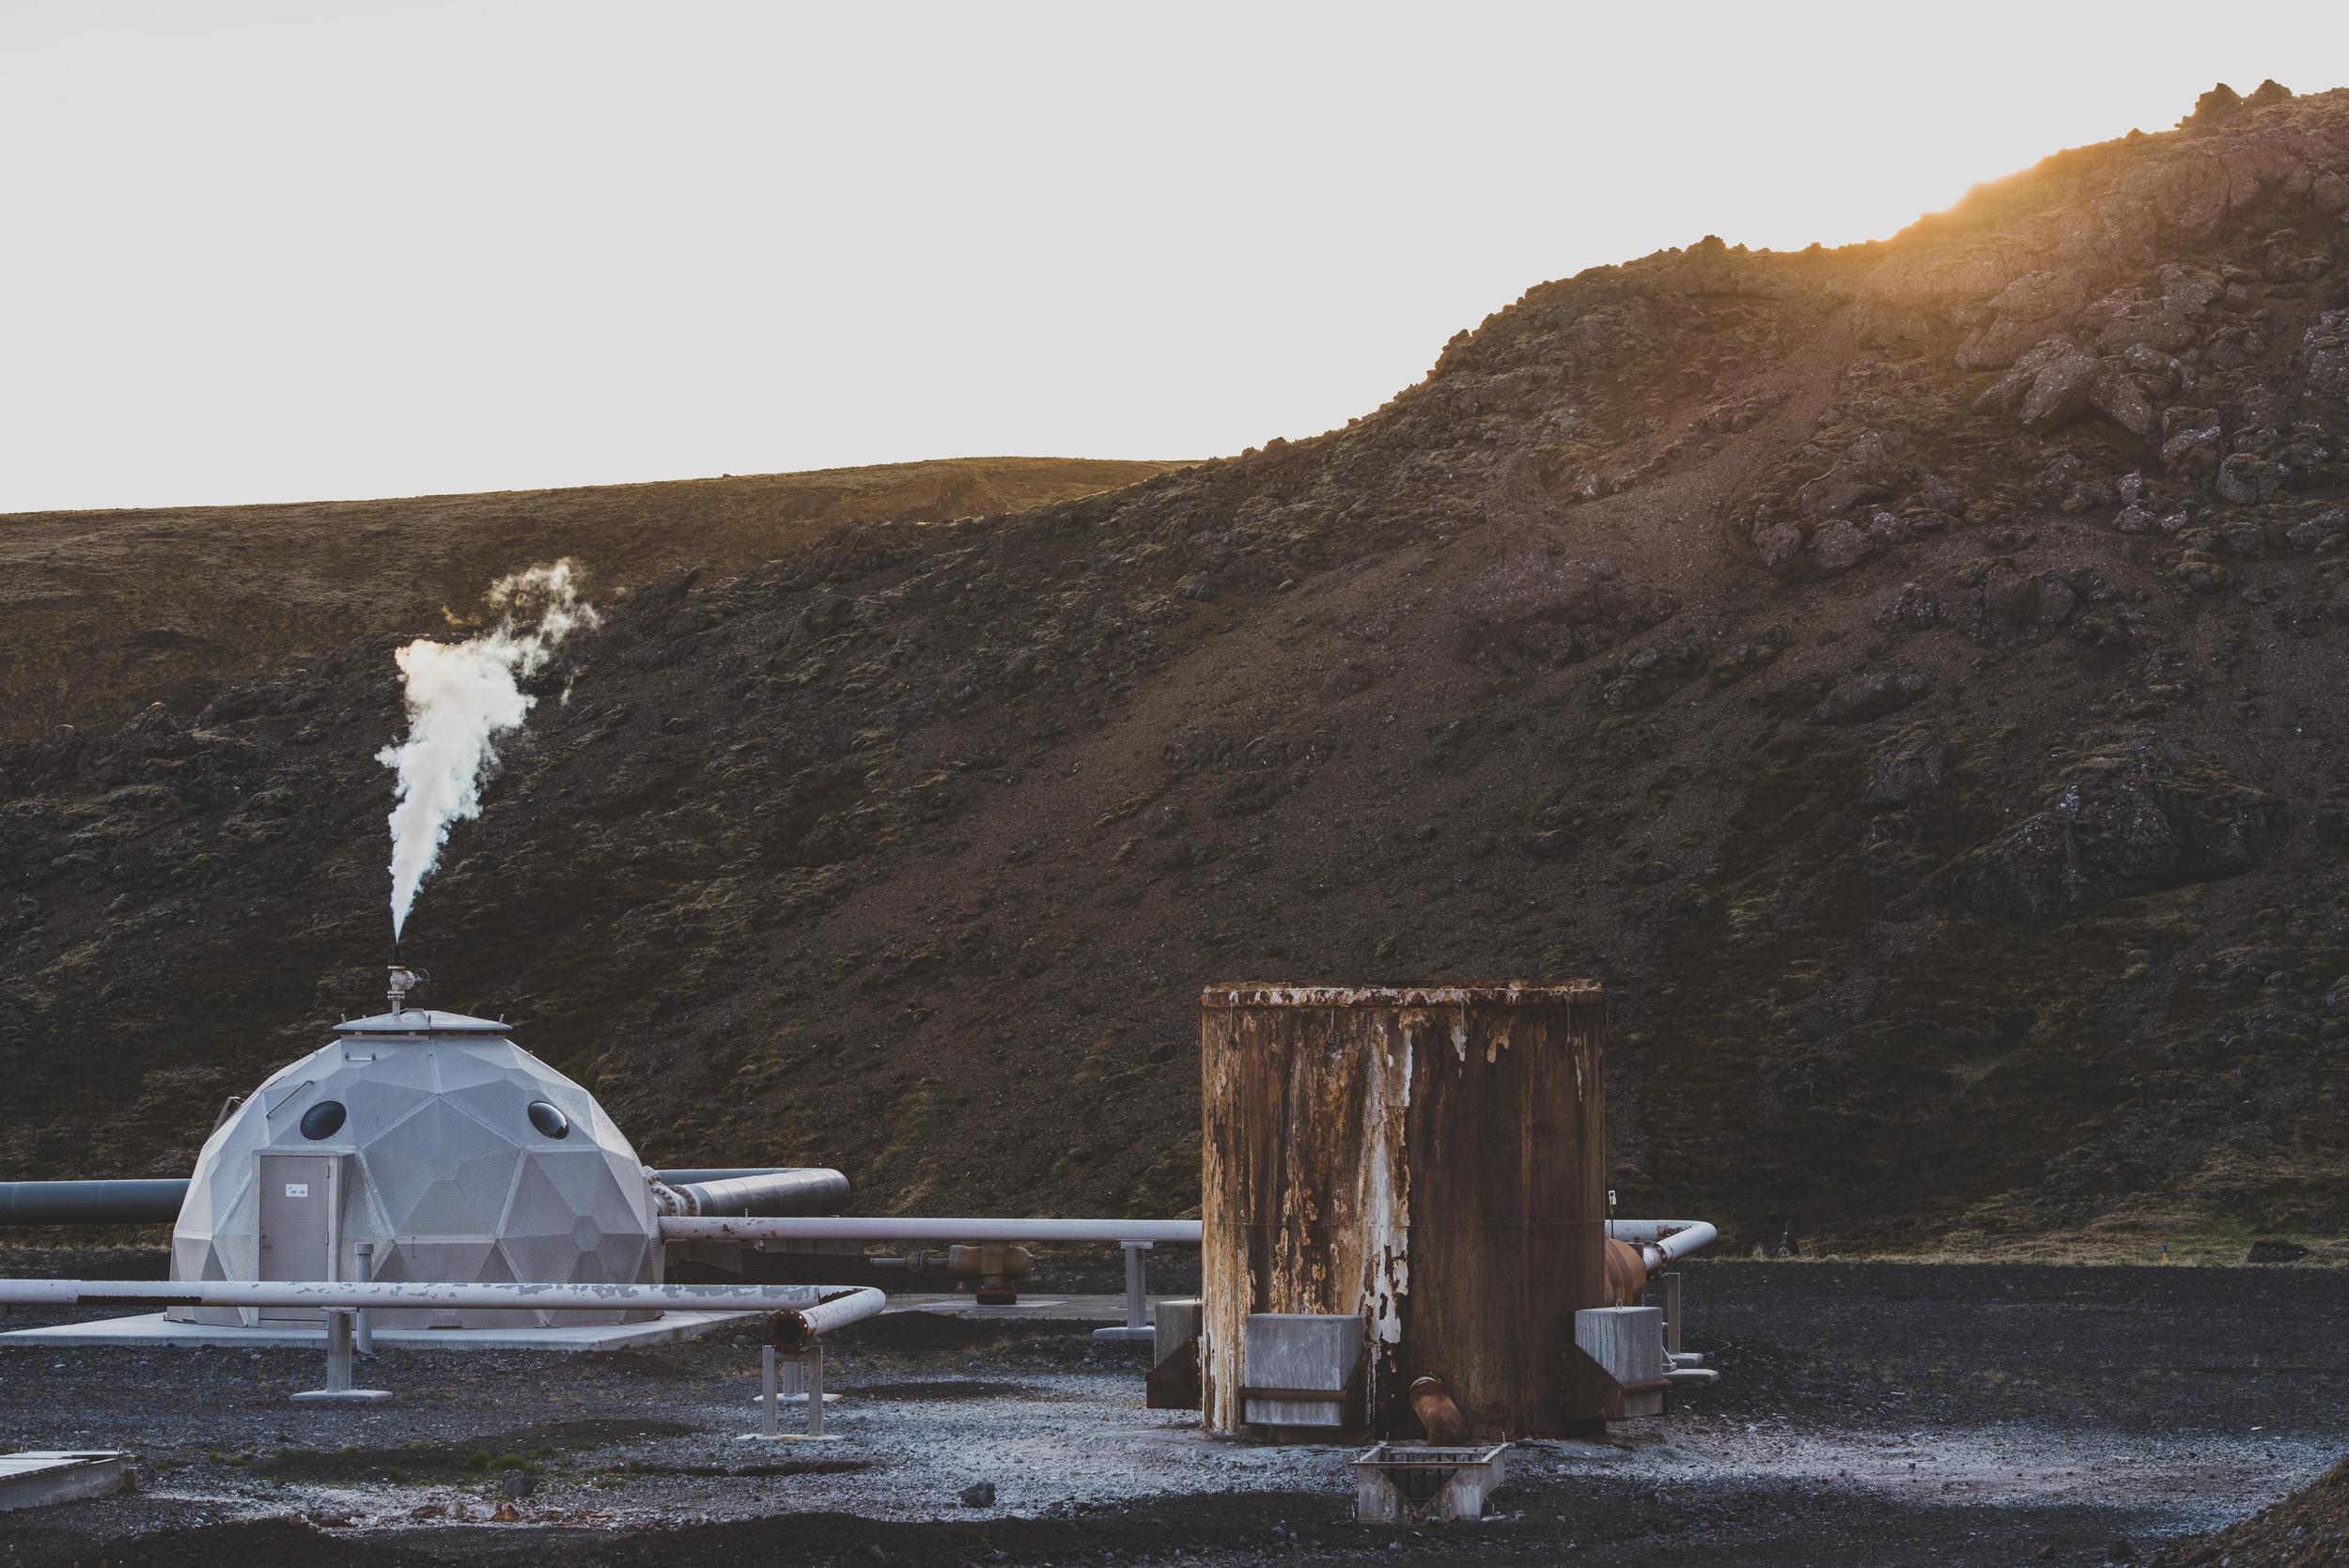 Joe Shutter Iceland Blogger Photographer Adventure-8.jpg